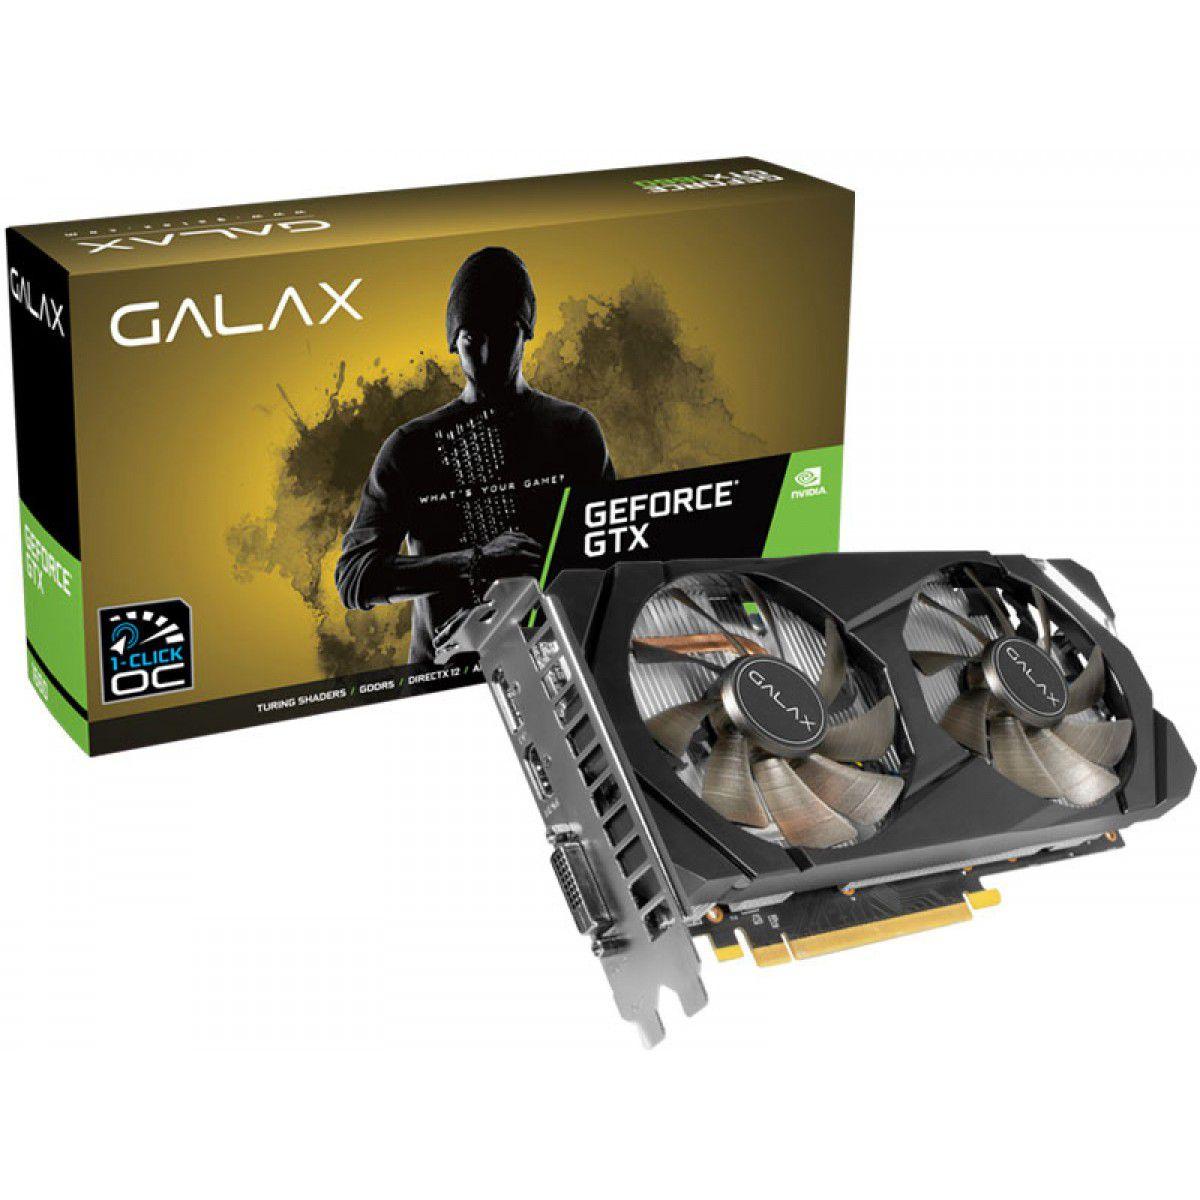 Placa De Video Geforce GTX NV Galax 1660 6GB